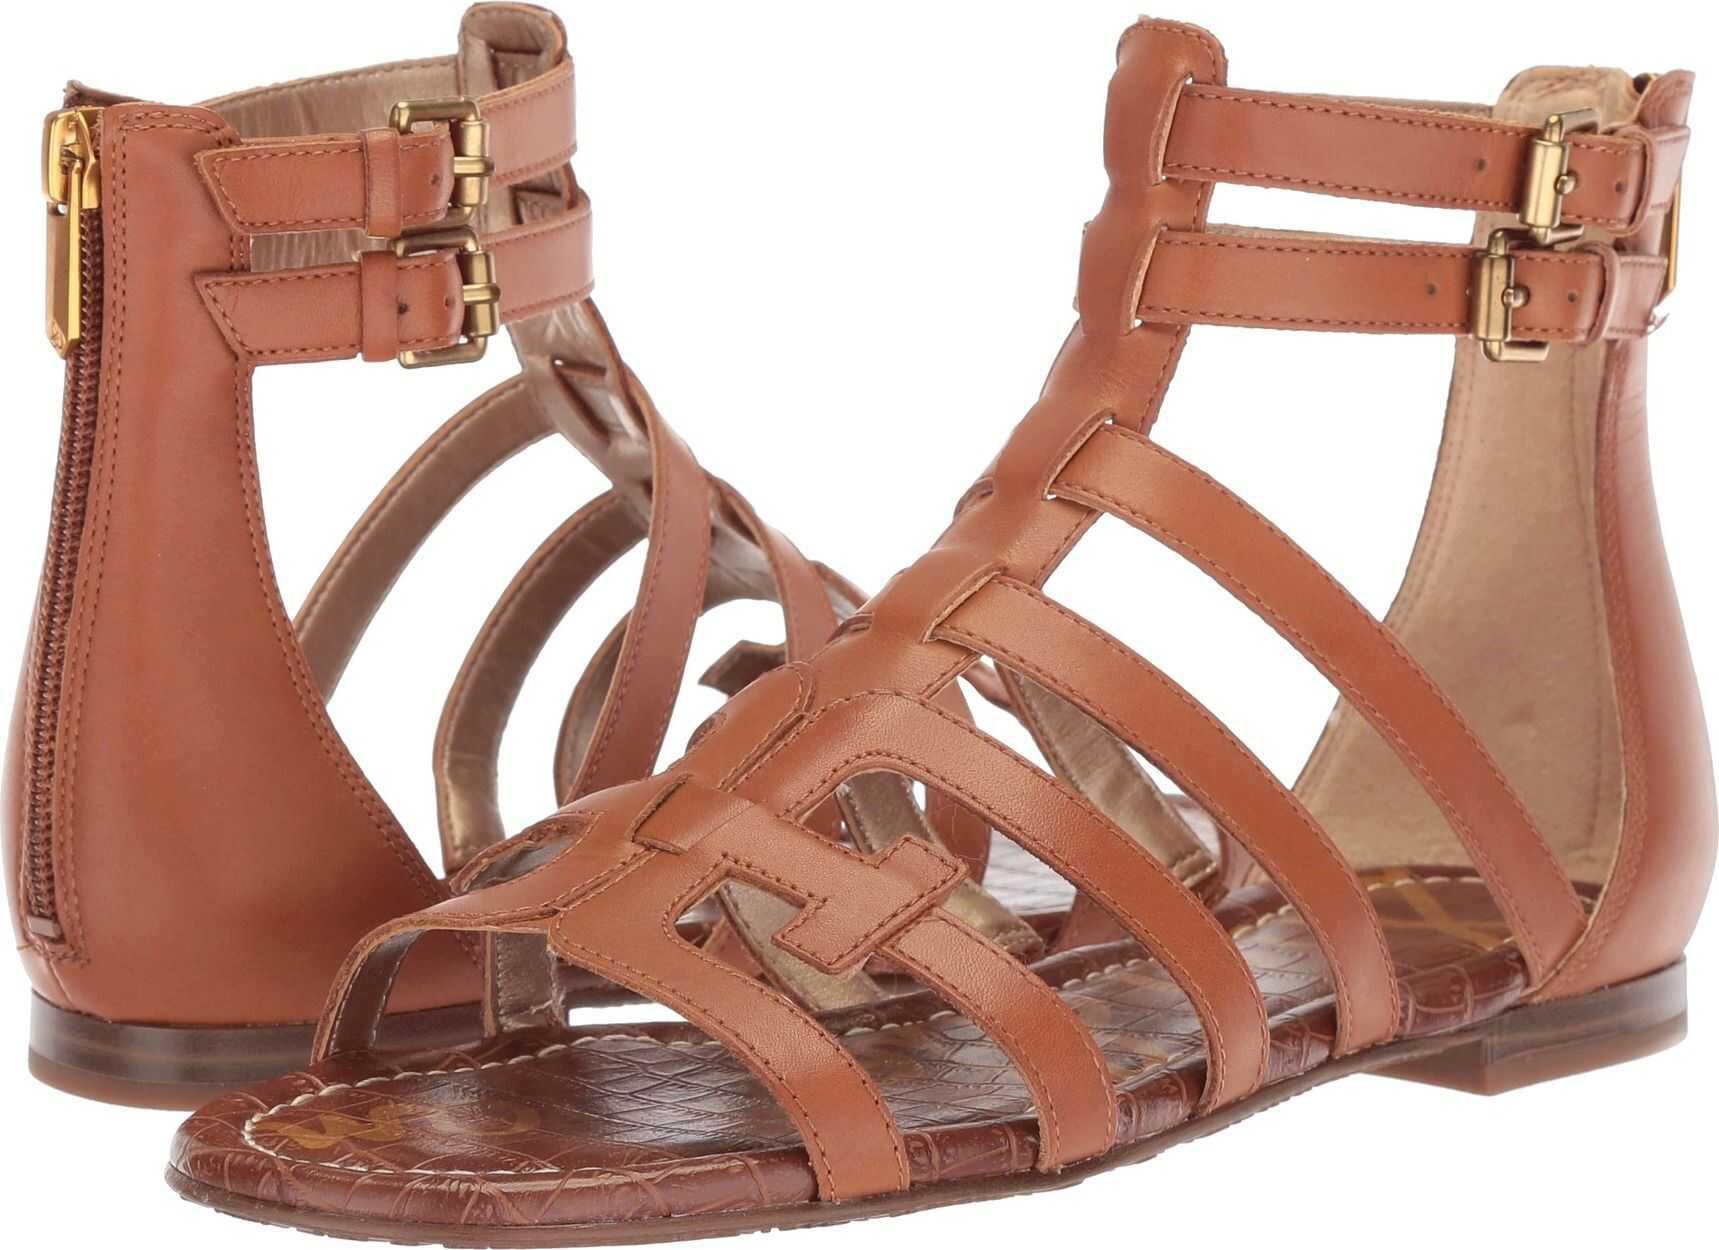 Sam Edelman Berke Saddle Vaquero Saddle Leather